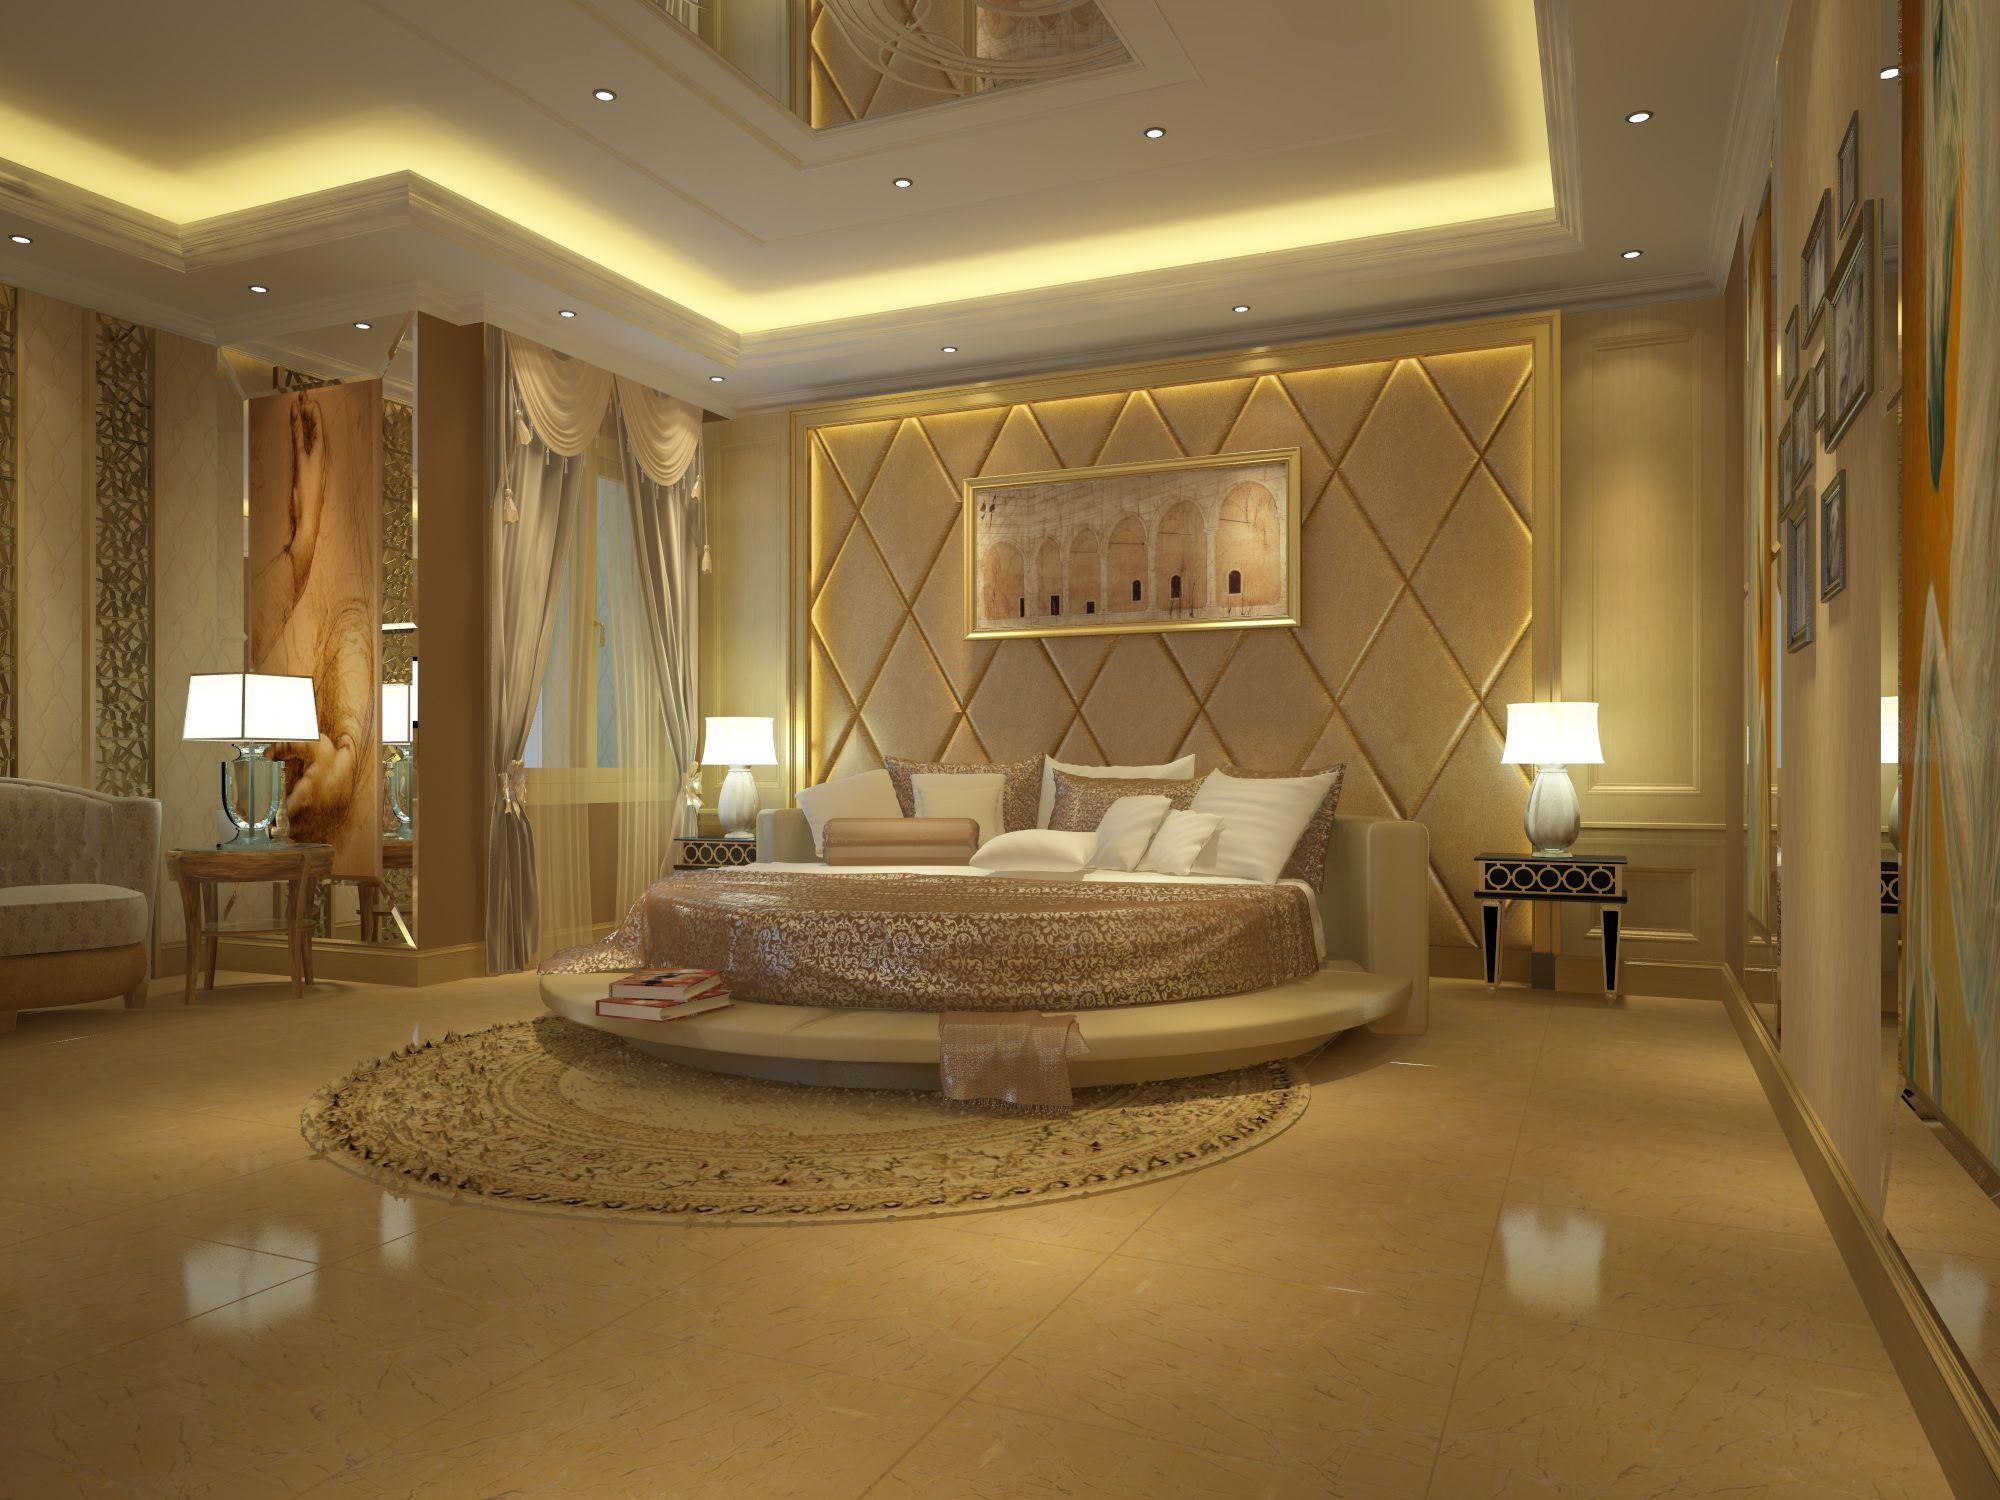 Emperador Marble Tiles In Bedroom